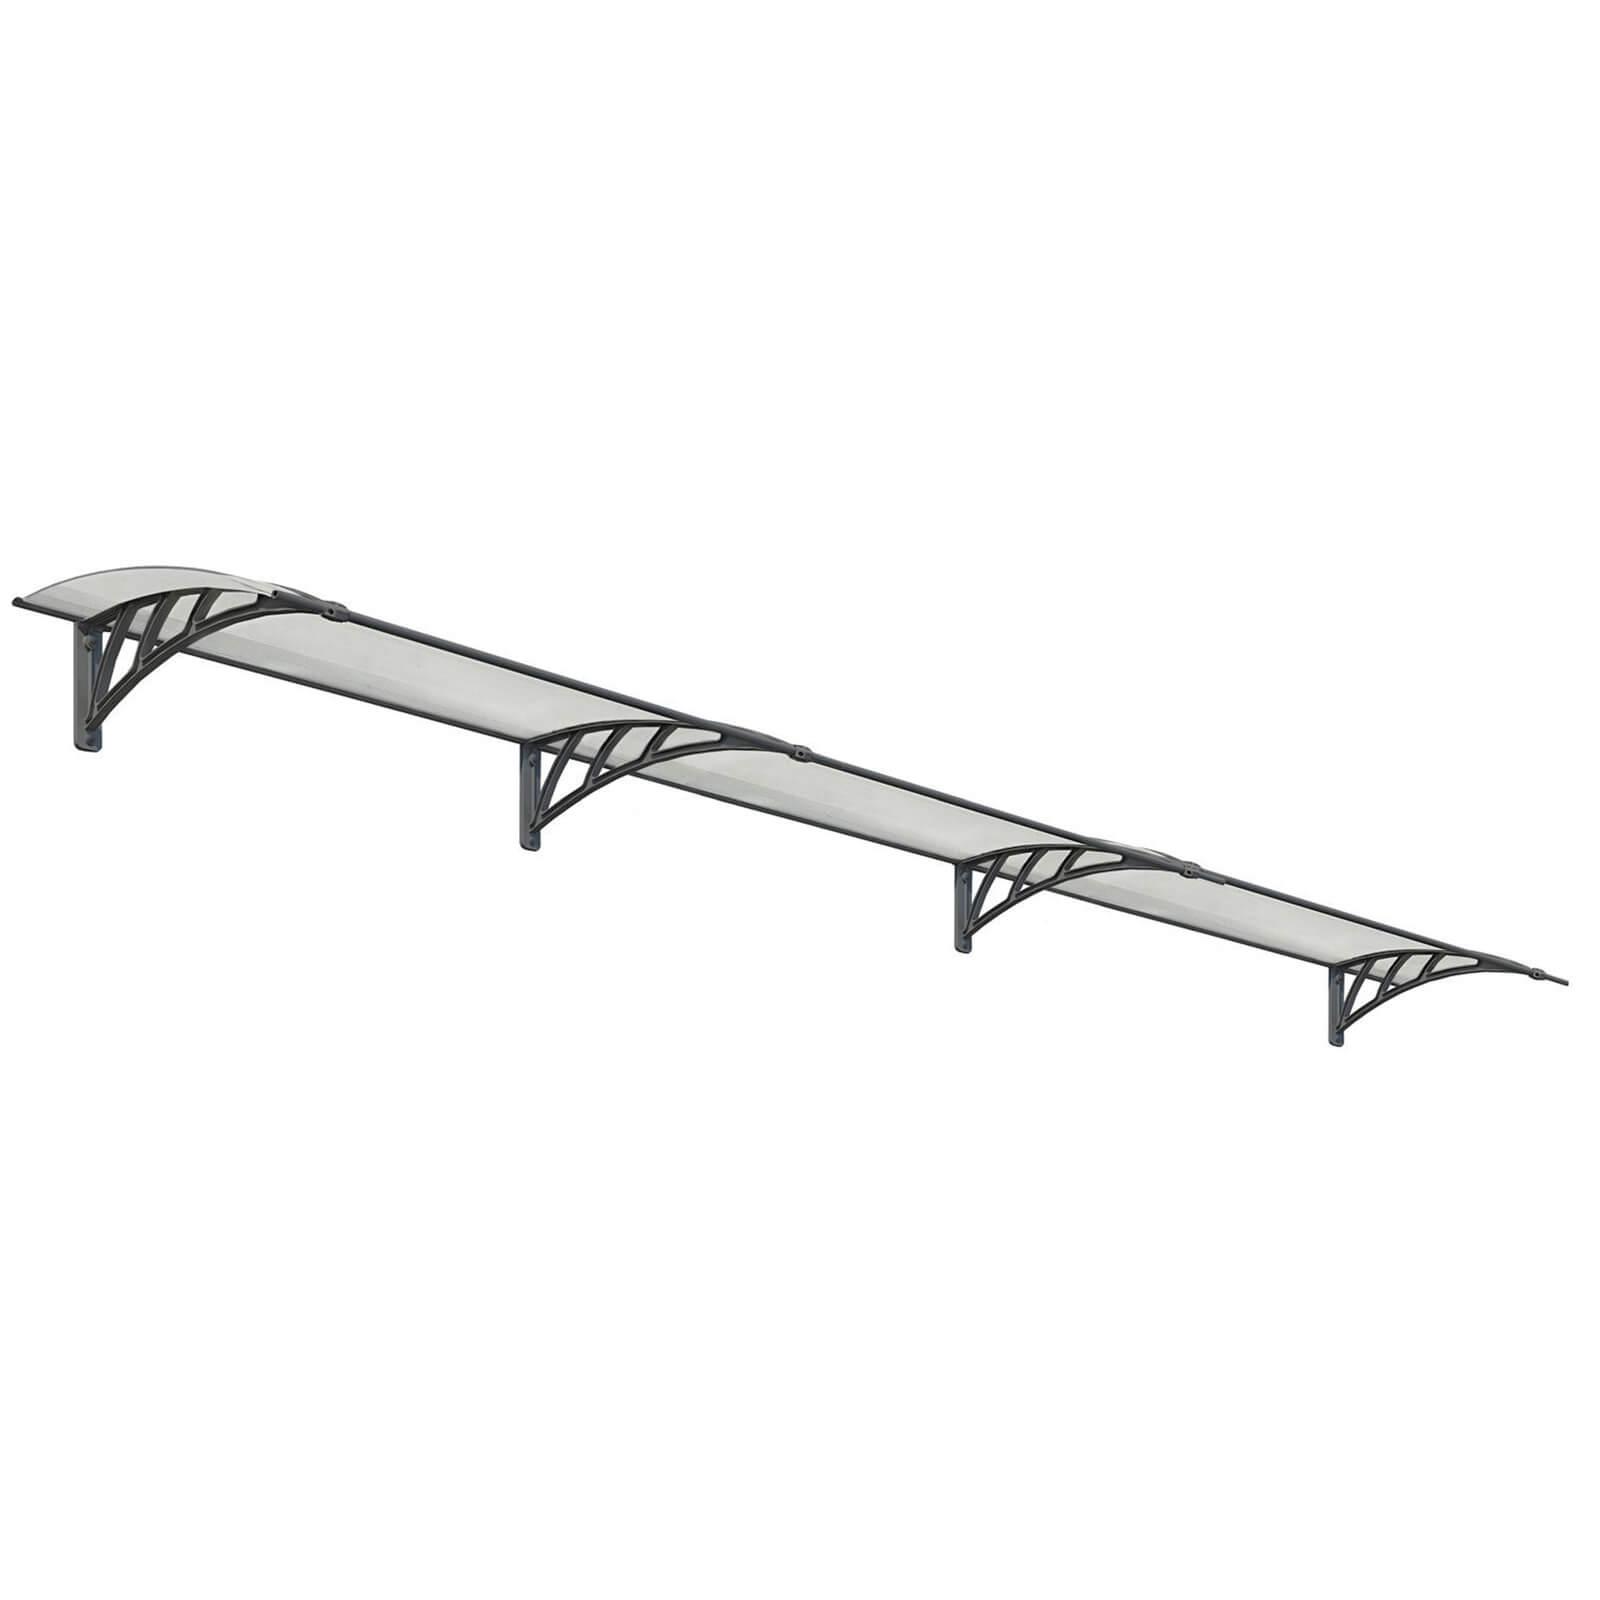 Palram - Canopia Canopy Neo 4050 Grey Twinwall